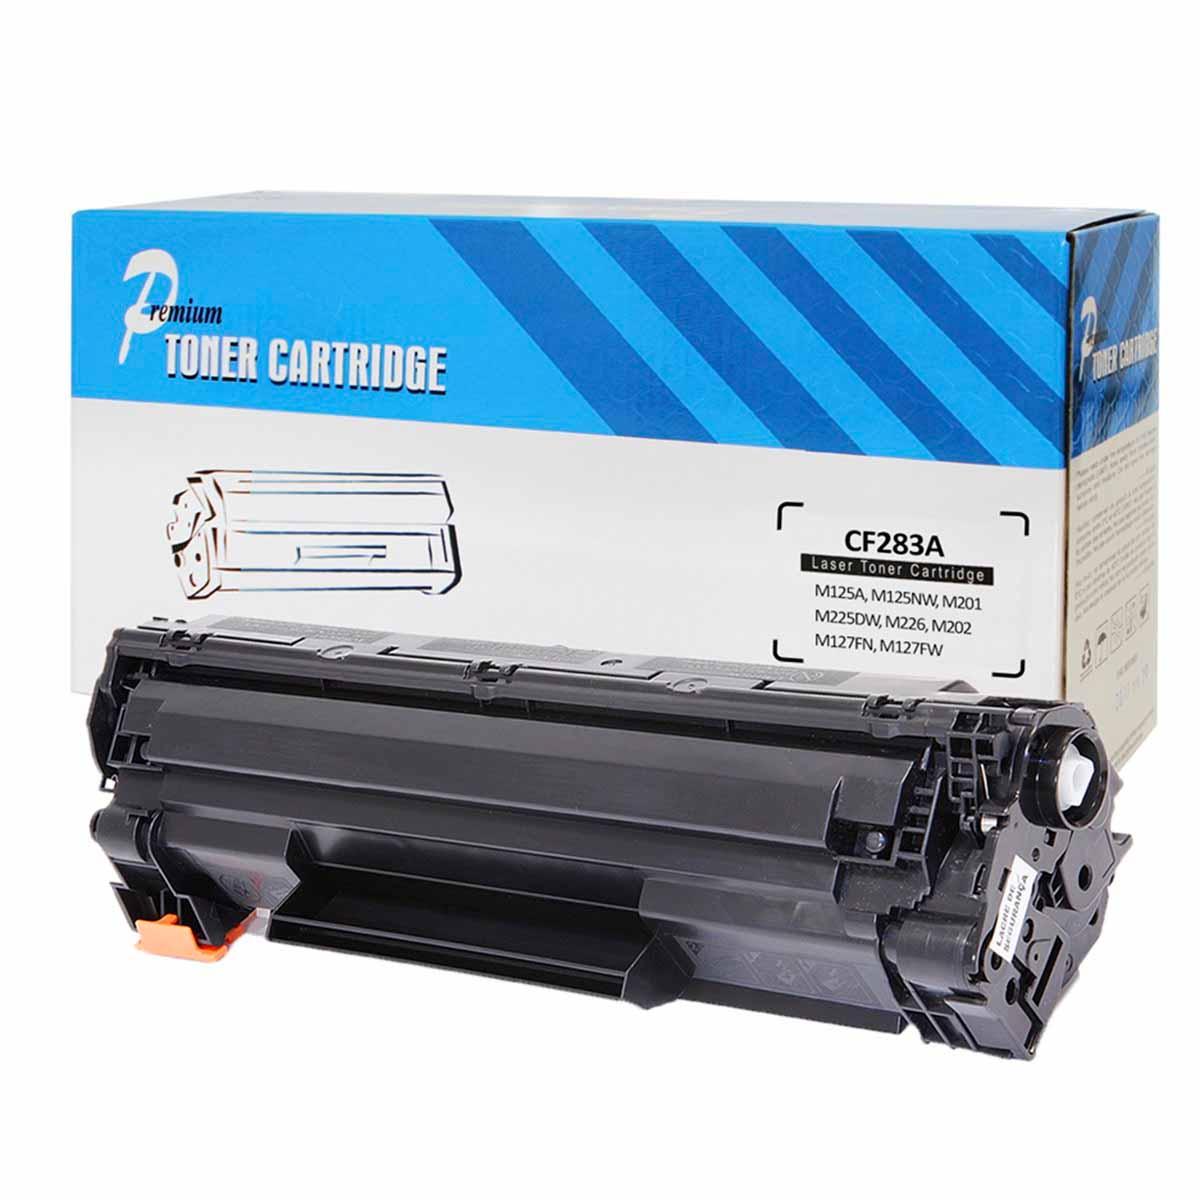 CARTUCHO HP (CF283A/83A) M127FN/M127FW/M127/M125/M201/M225/M226/M202/M201DW COMPATÍVEL